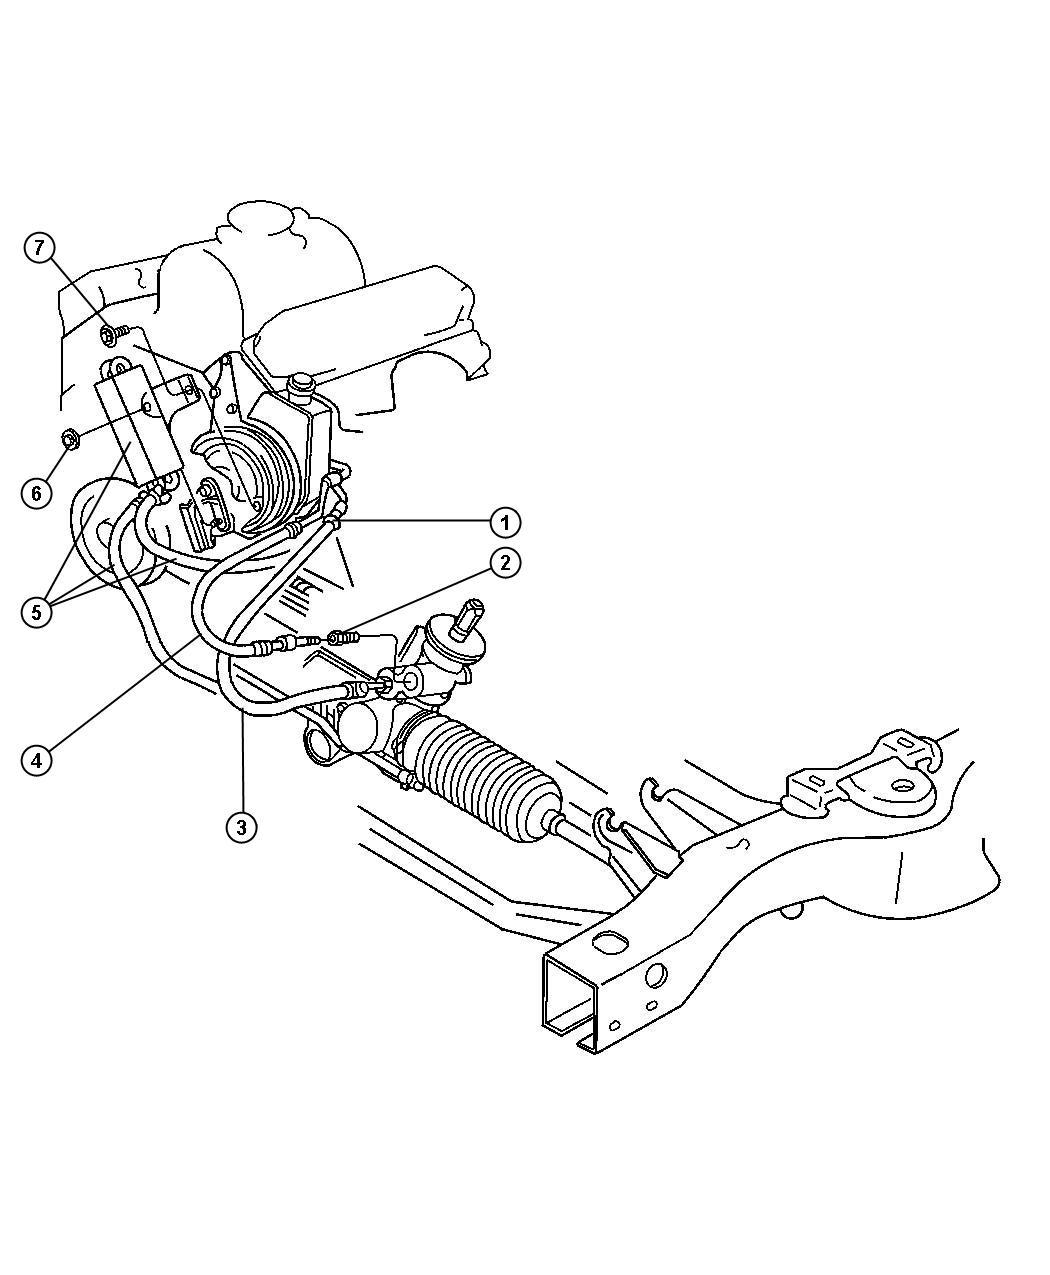 durango power steering pump diagram 97 chevy s10 wiring 1999 dodge hoses with eh0 el0 em0 dn1